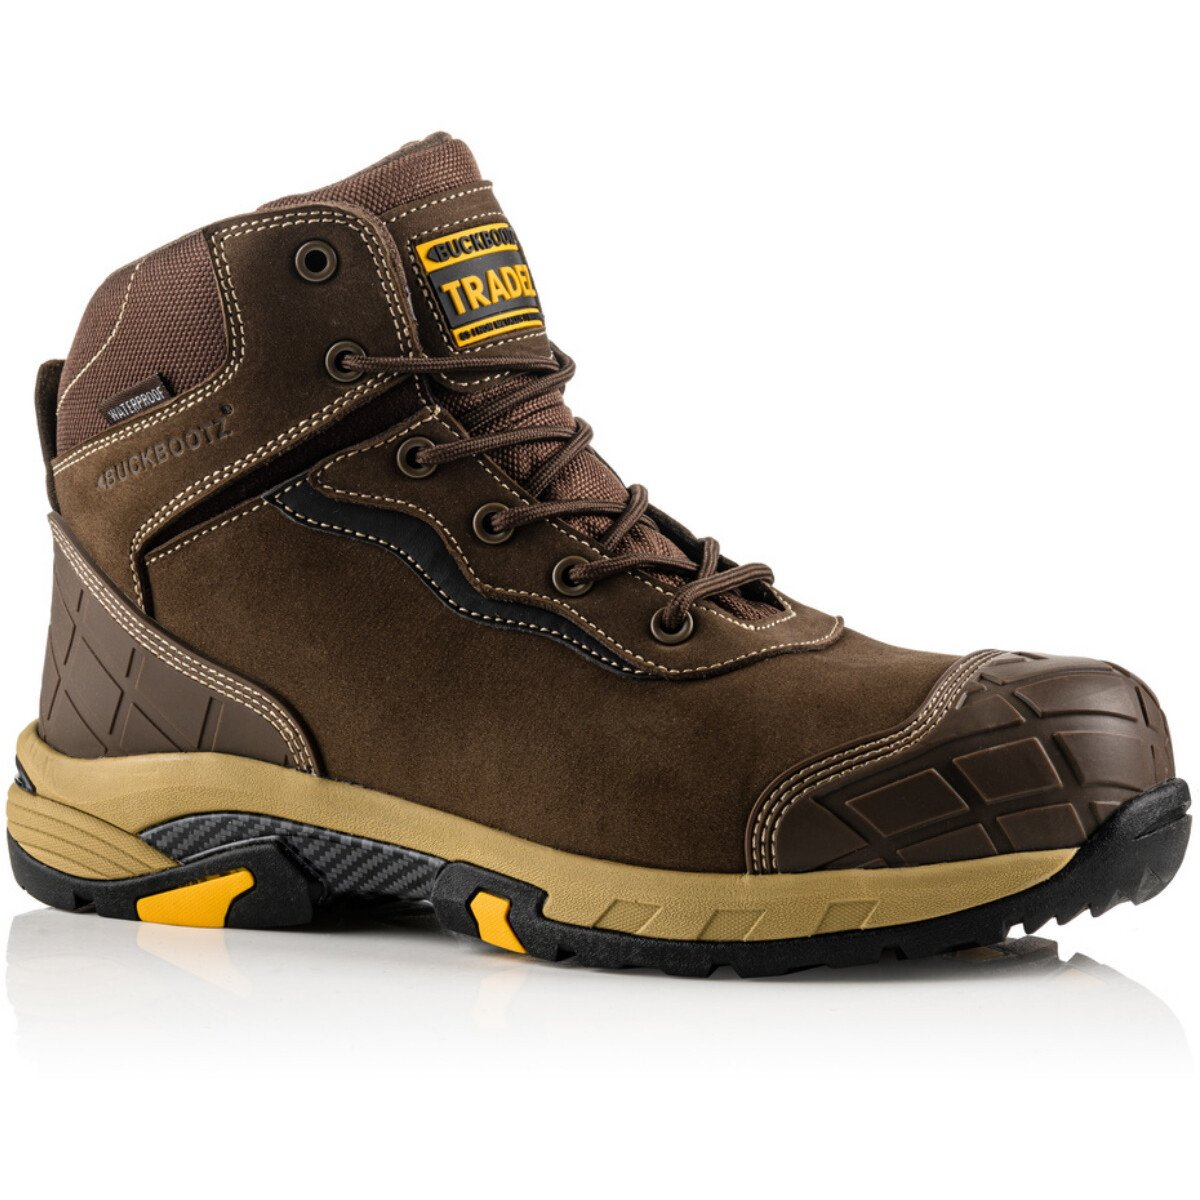 Buckbootz Tradez© BLITZ Lightweight Metal Free Waterproof Leather Safety Boot S3 HRO SRC